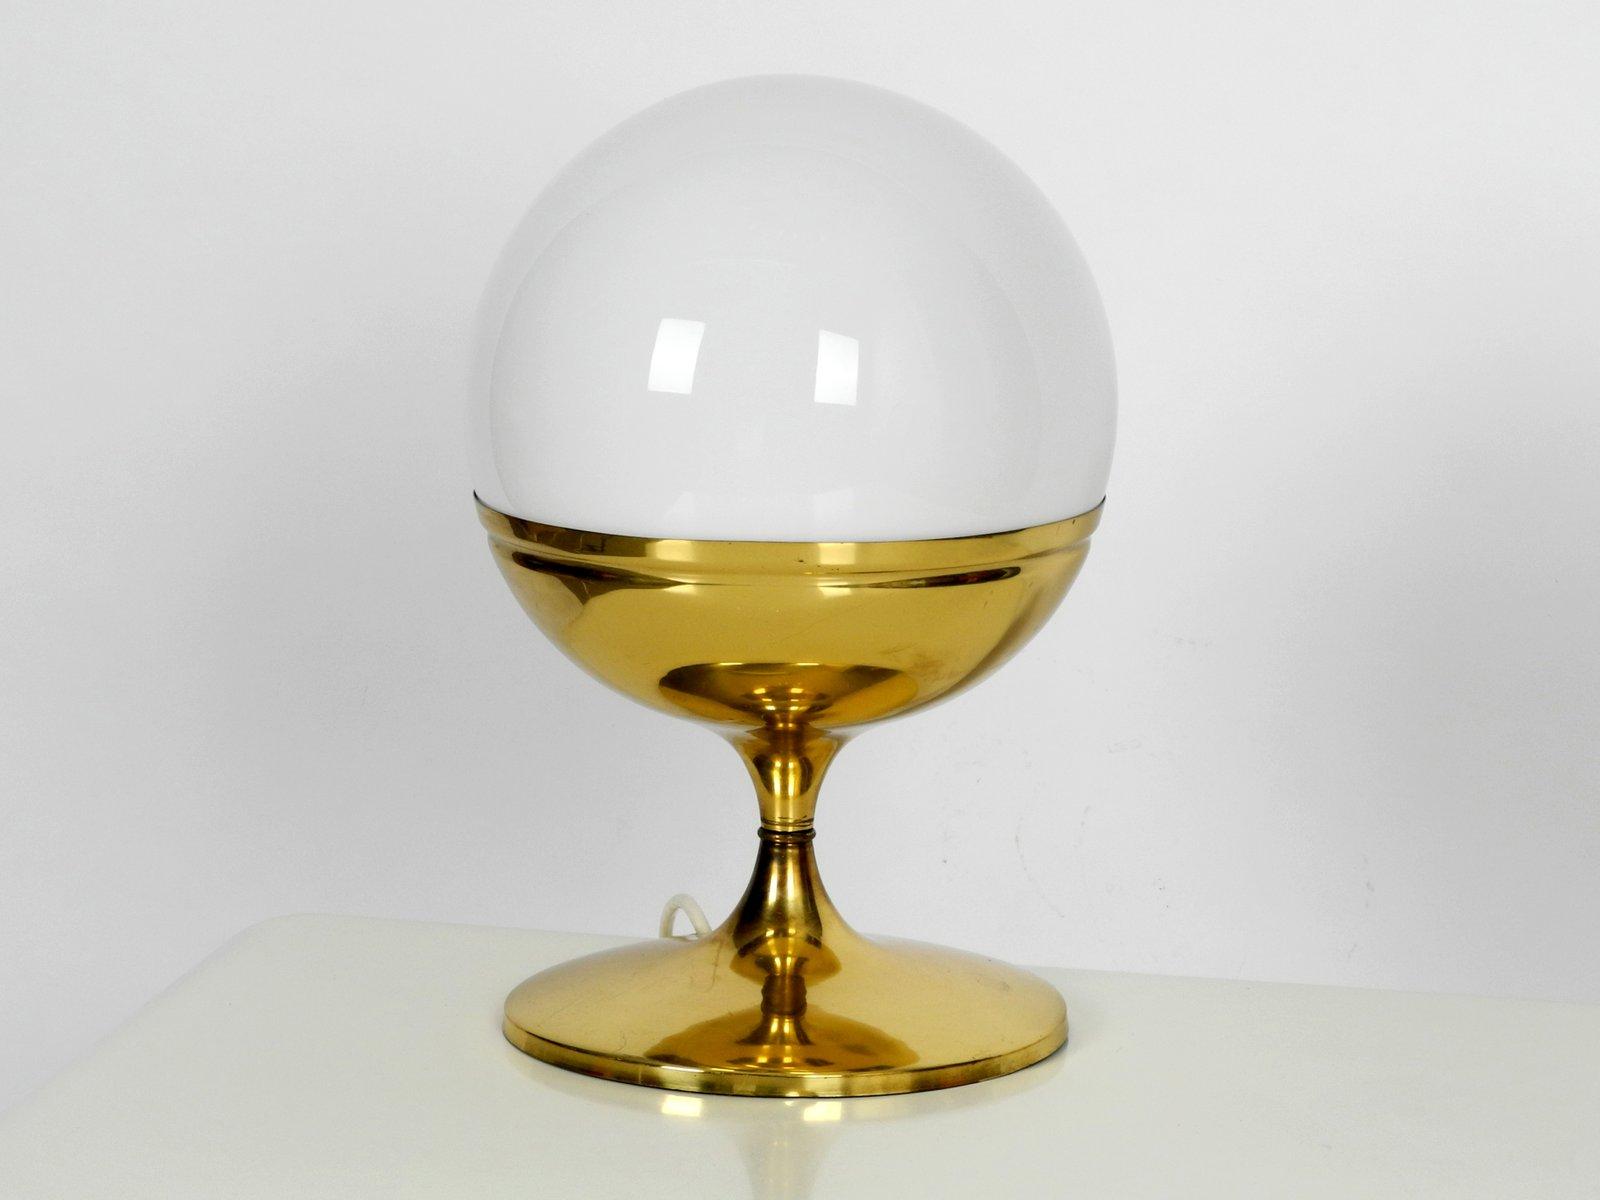 Große Tulip Space Age Tischlampe aus Messing mit Glaskugel, 1960er